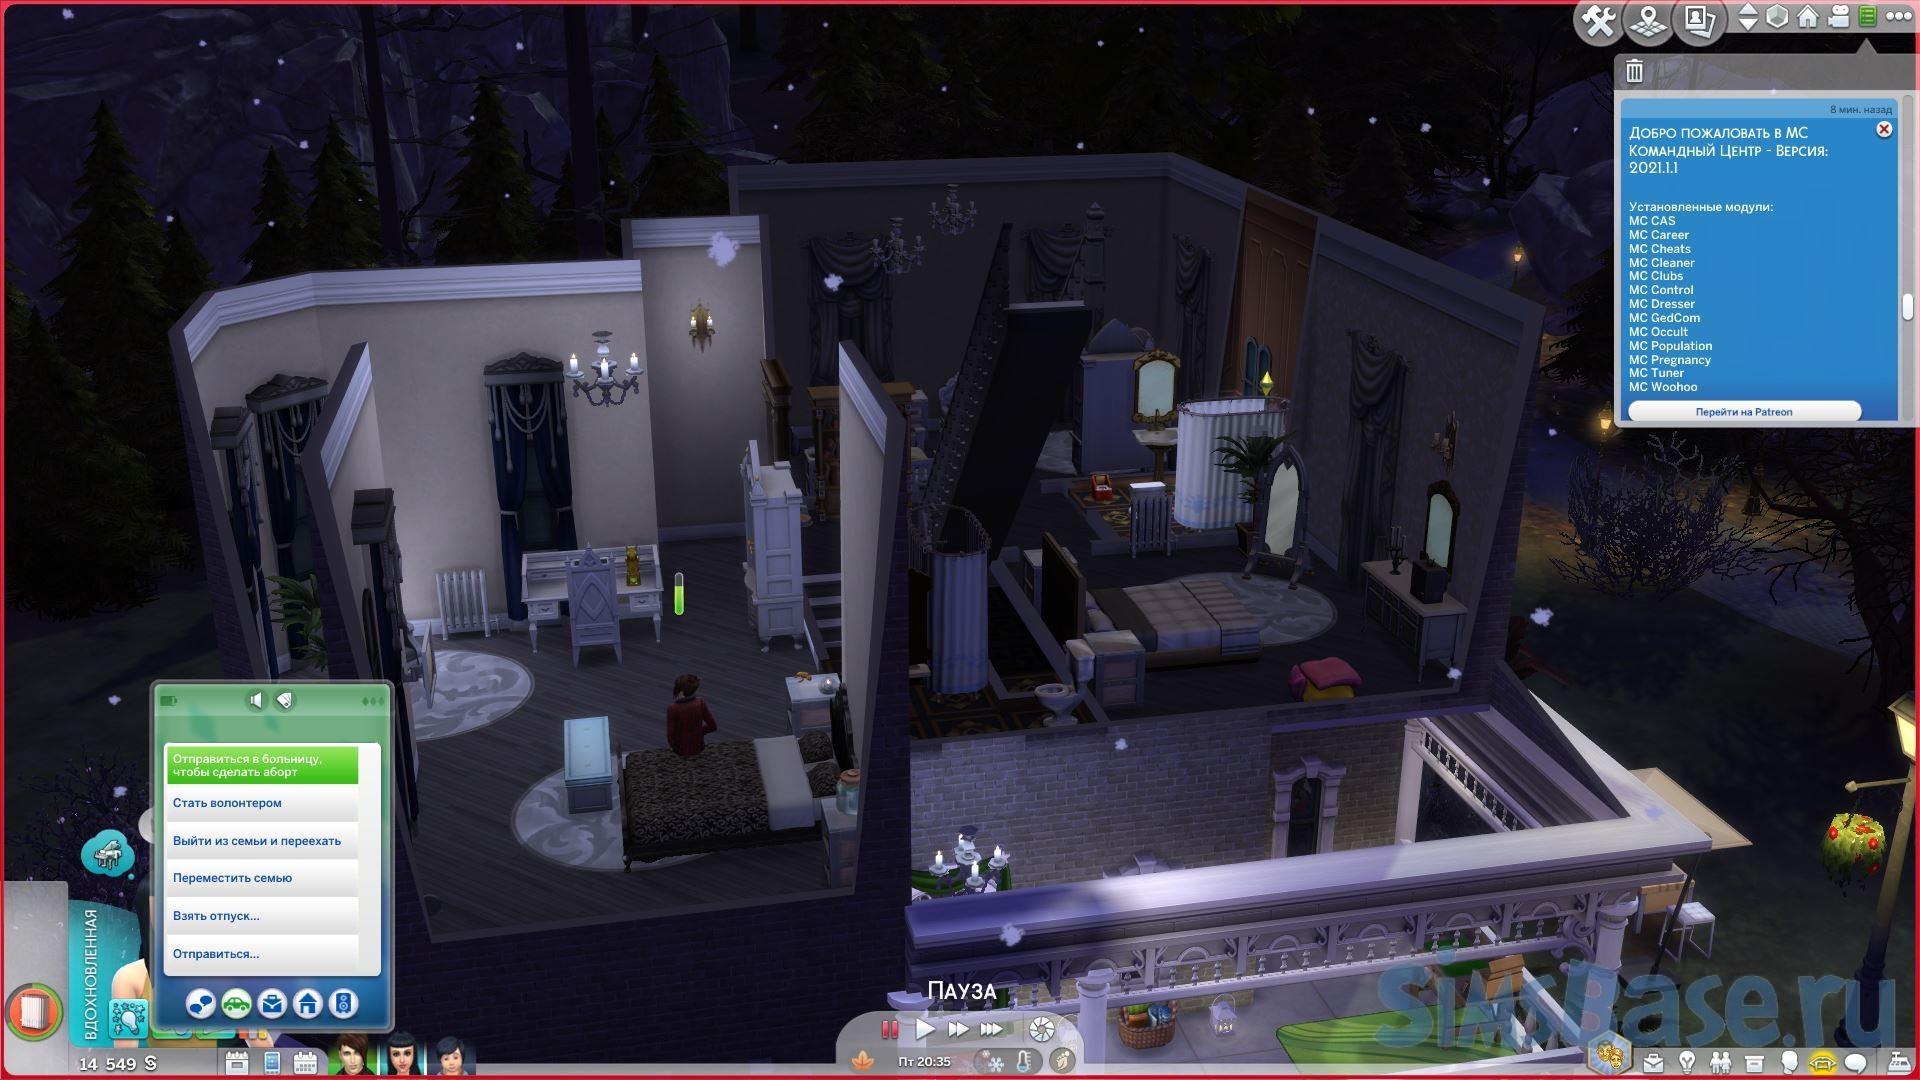 Мод «Выкидыш и аборт» от littlemssam для Sims 4